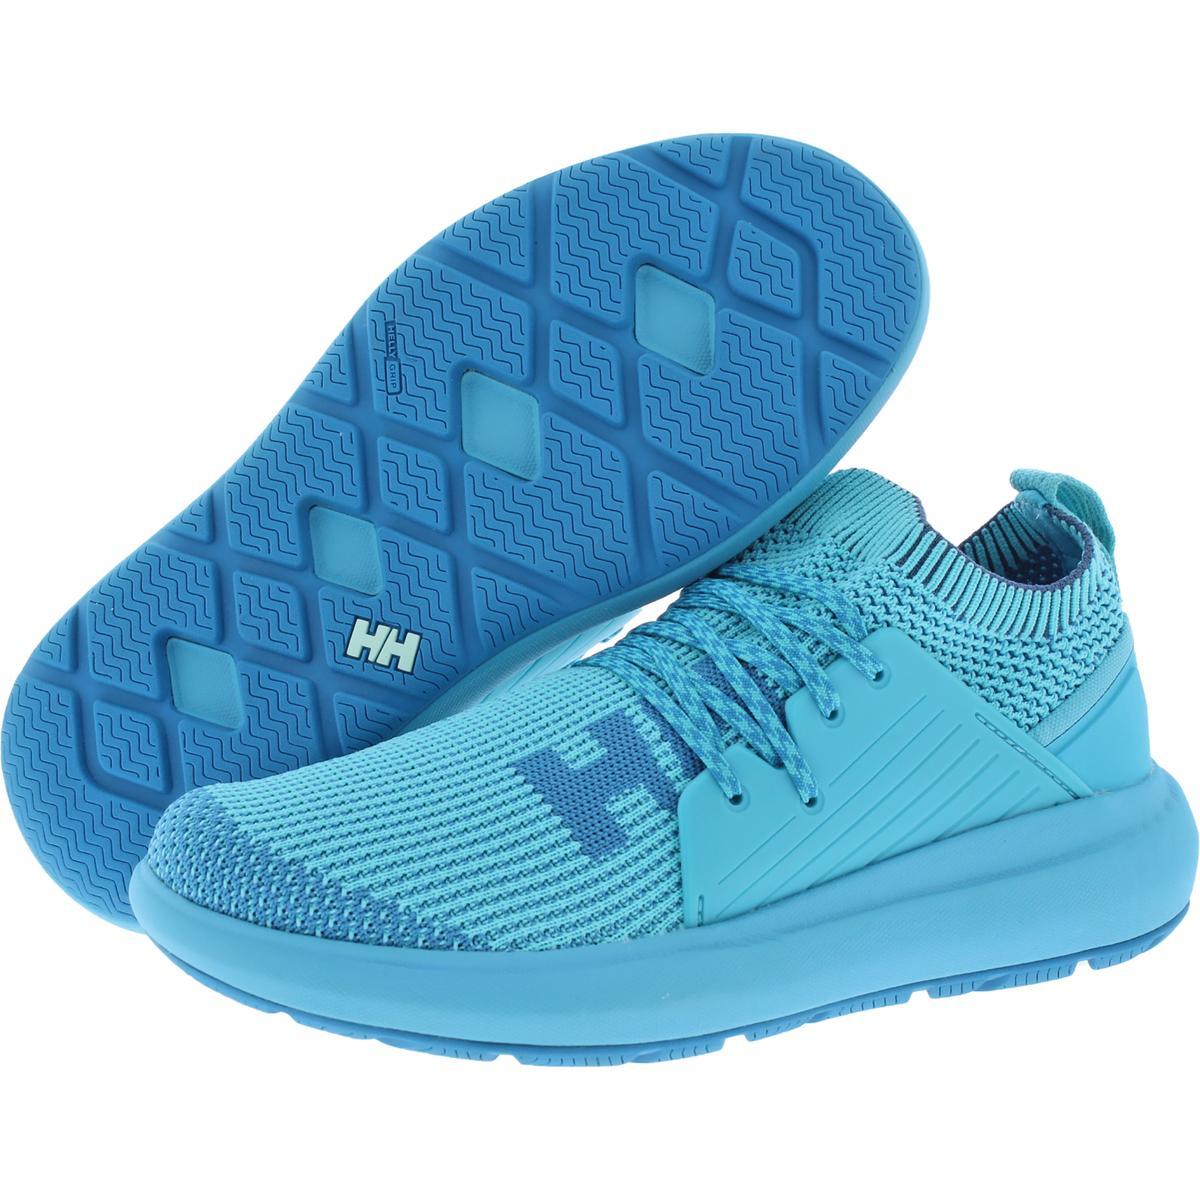 thumbnail 5 - Helly-Hansen-Womens-Razorskiff-Knit-Breathable-Fashion-Sneakers-Shoes-BHFO-8932